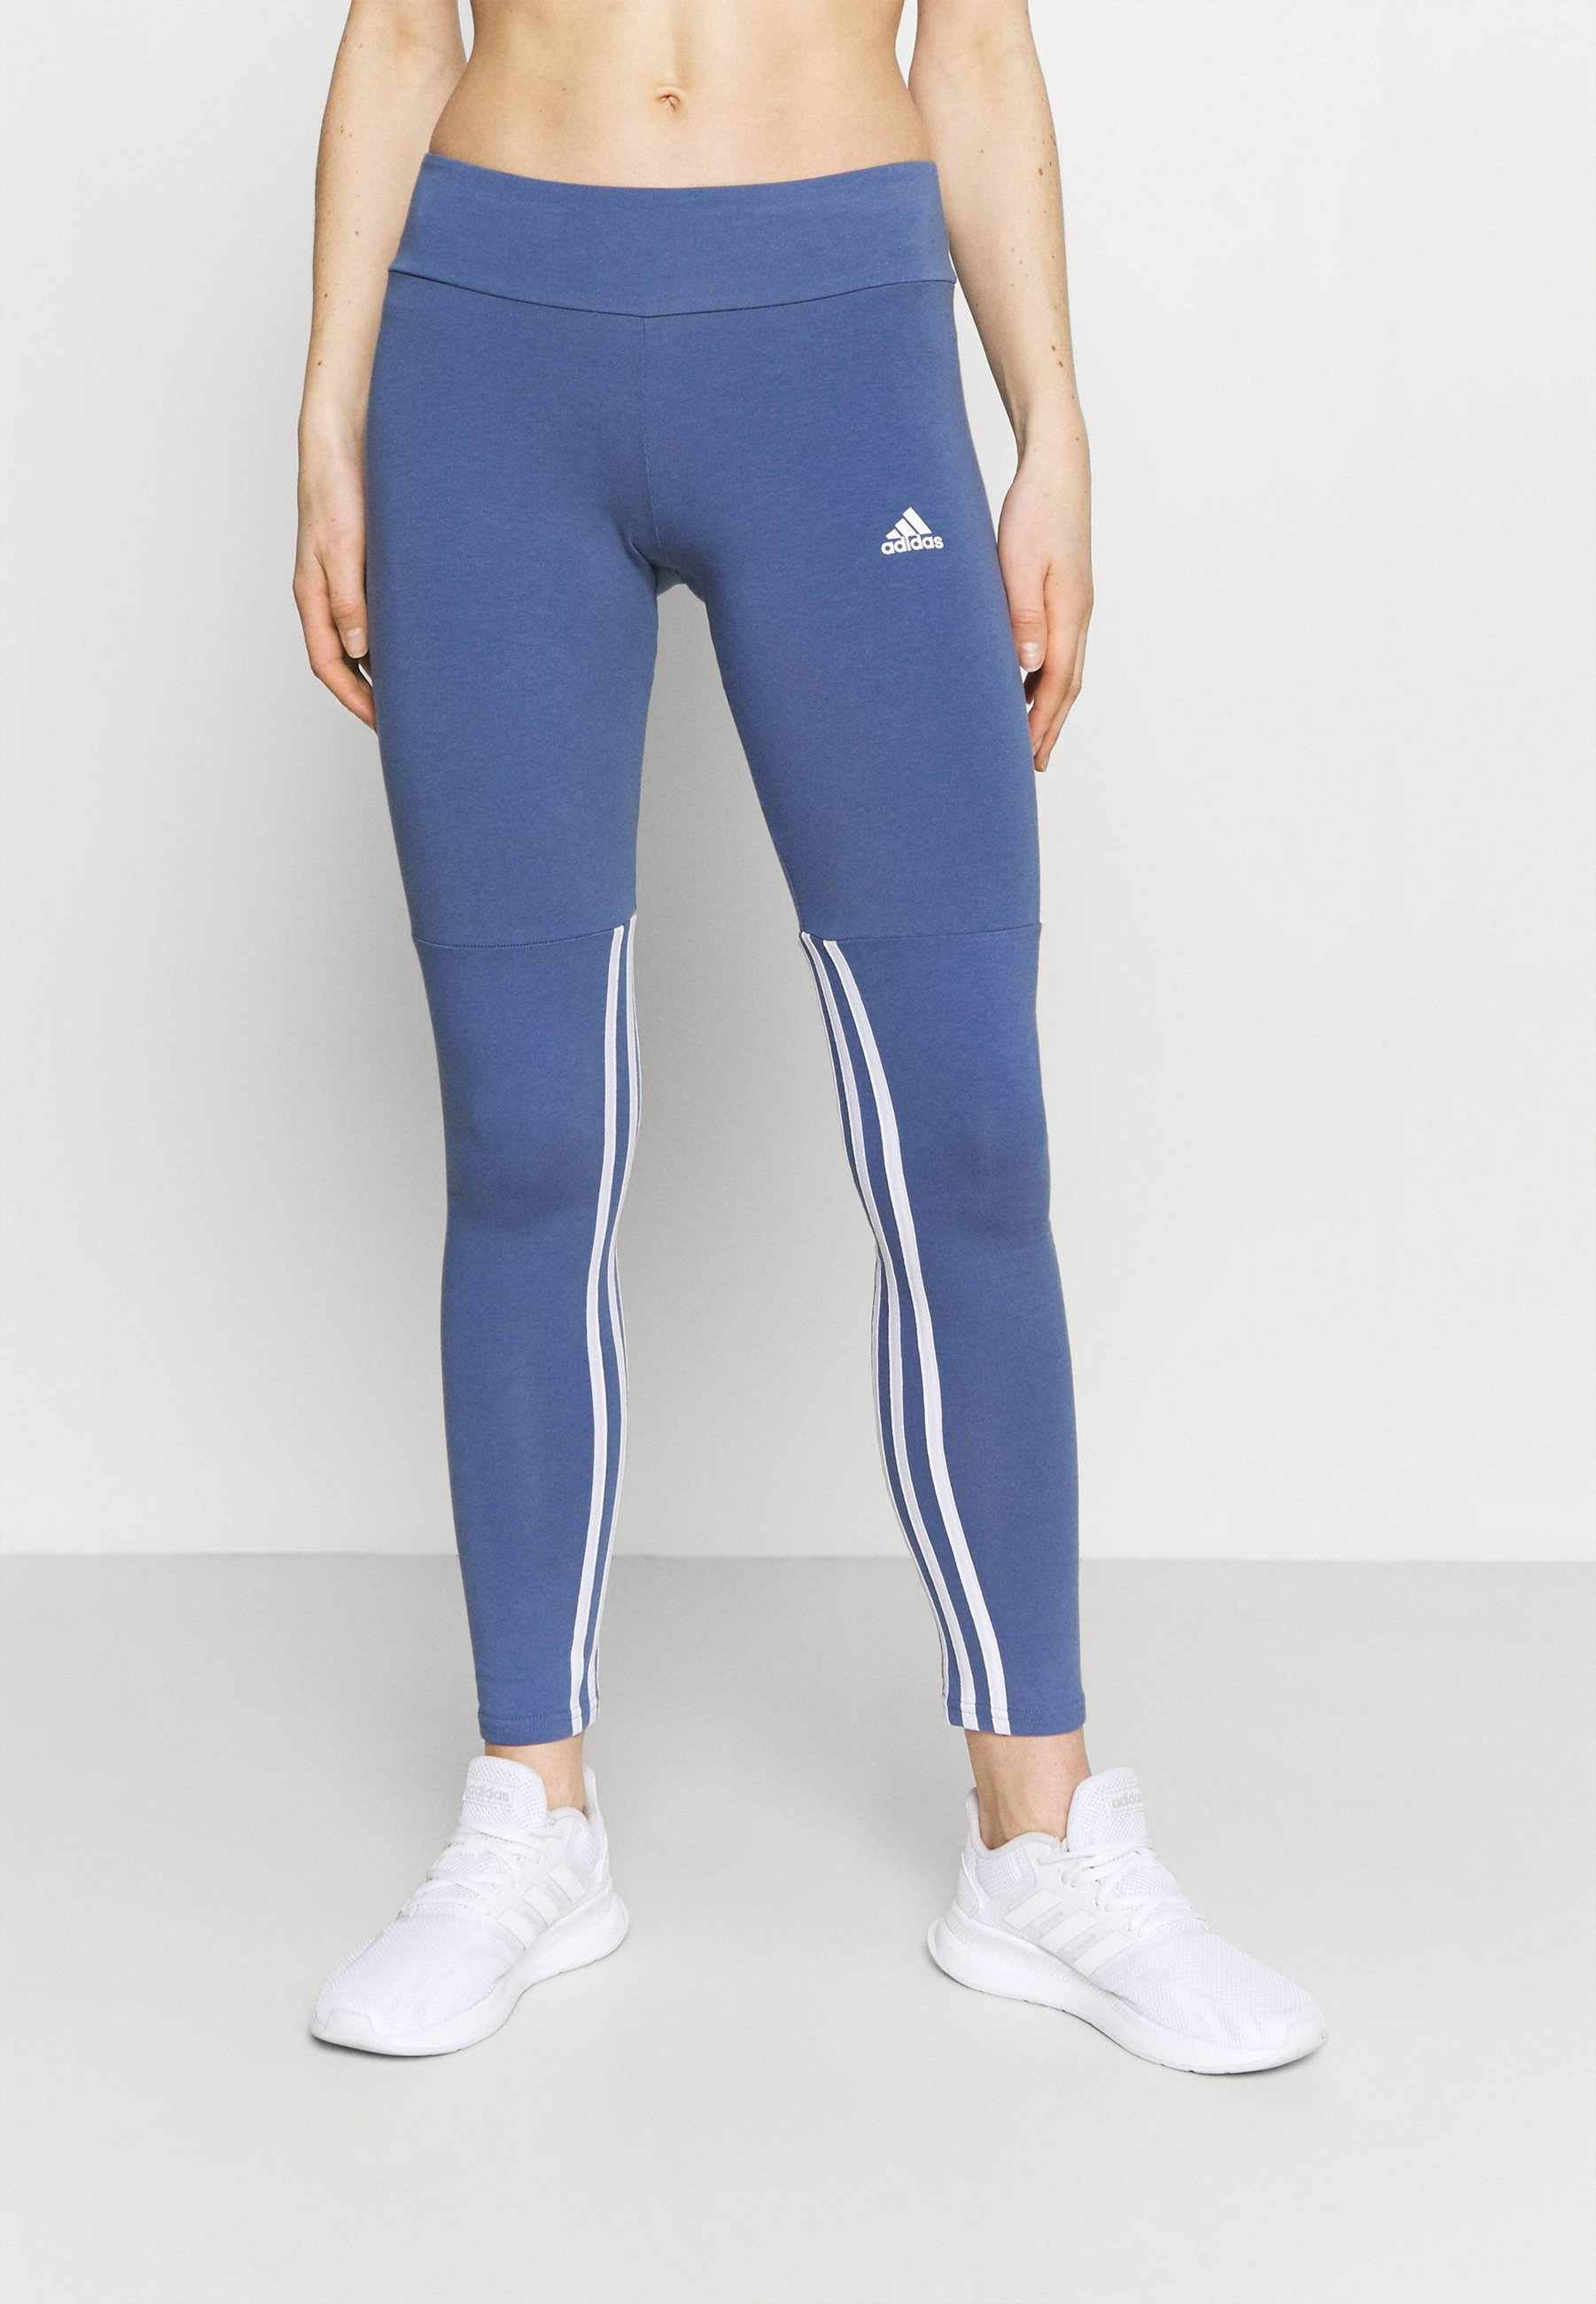 Femme LEG - Collants